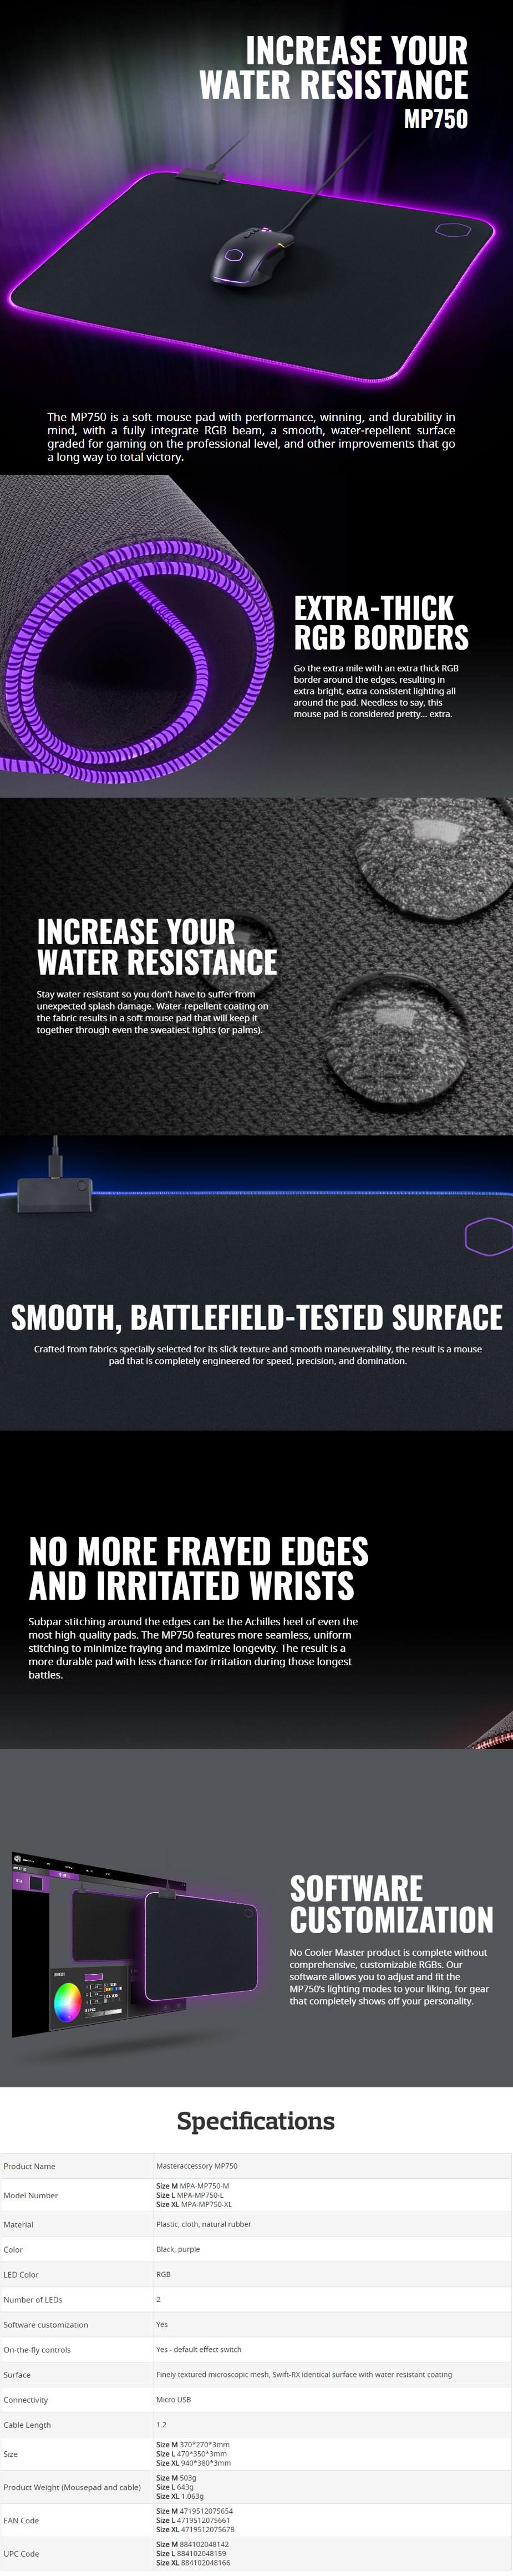 Cooler Master MP750 RGB Gaming Mouse Pad - Medium - Desktop Overview 1